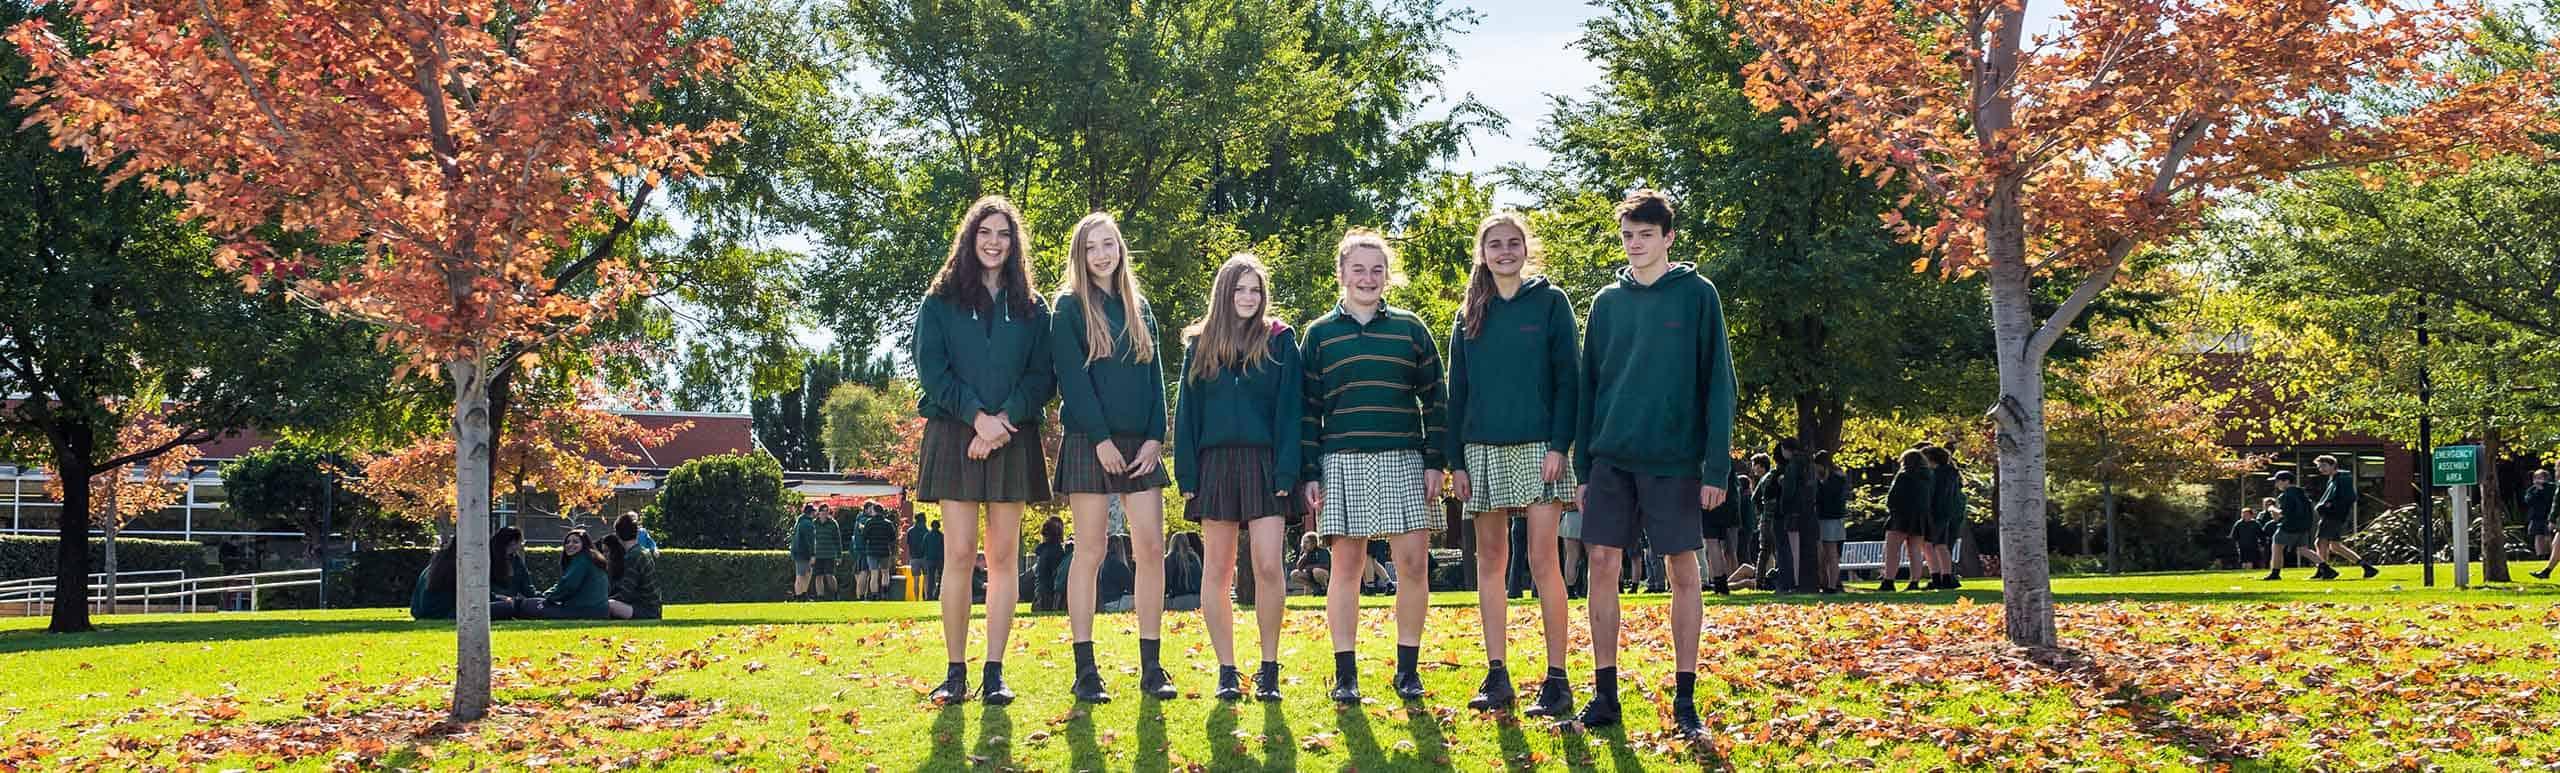 Urrbrae Agricultural High School Uniforms